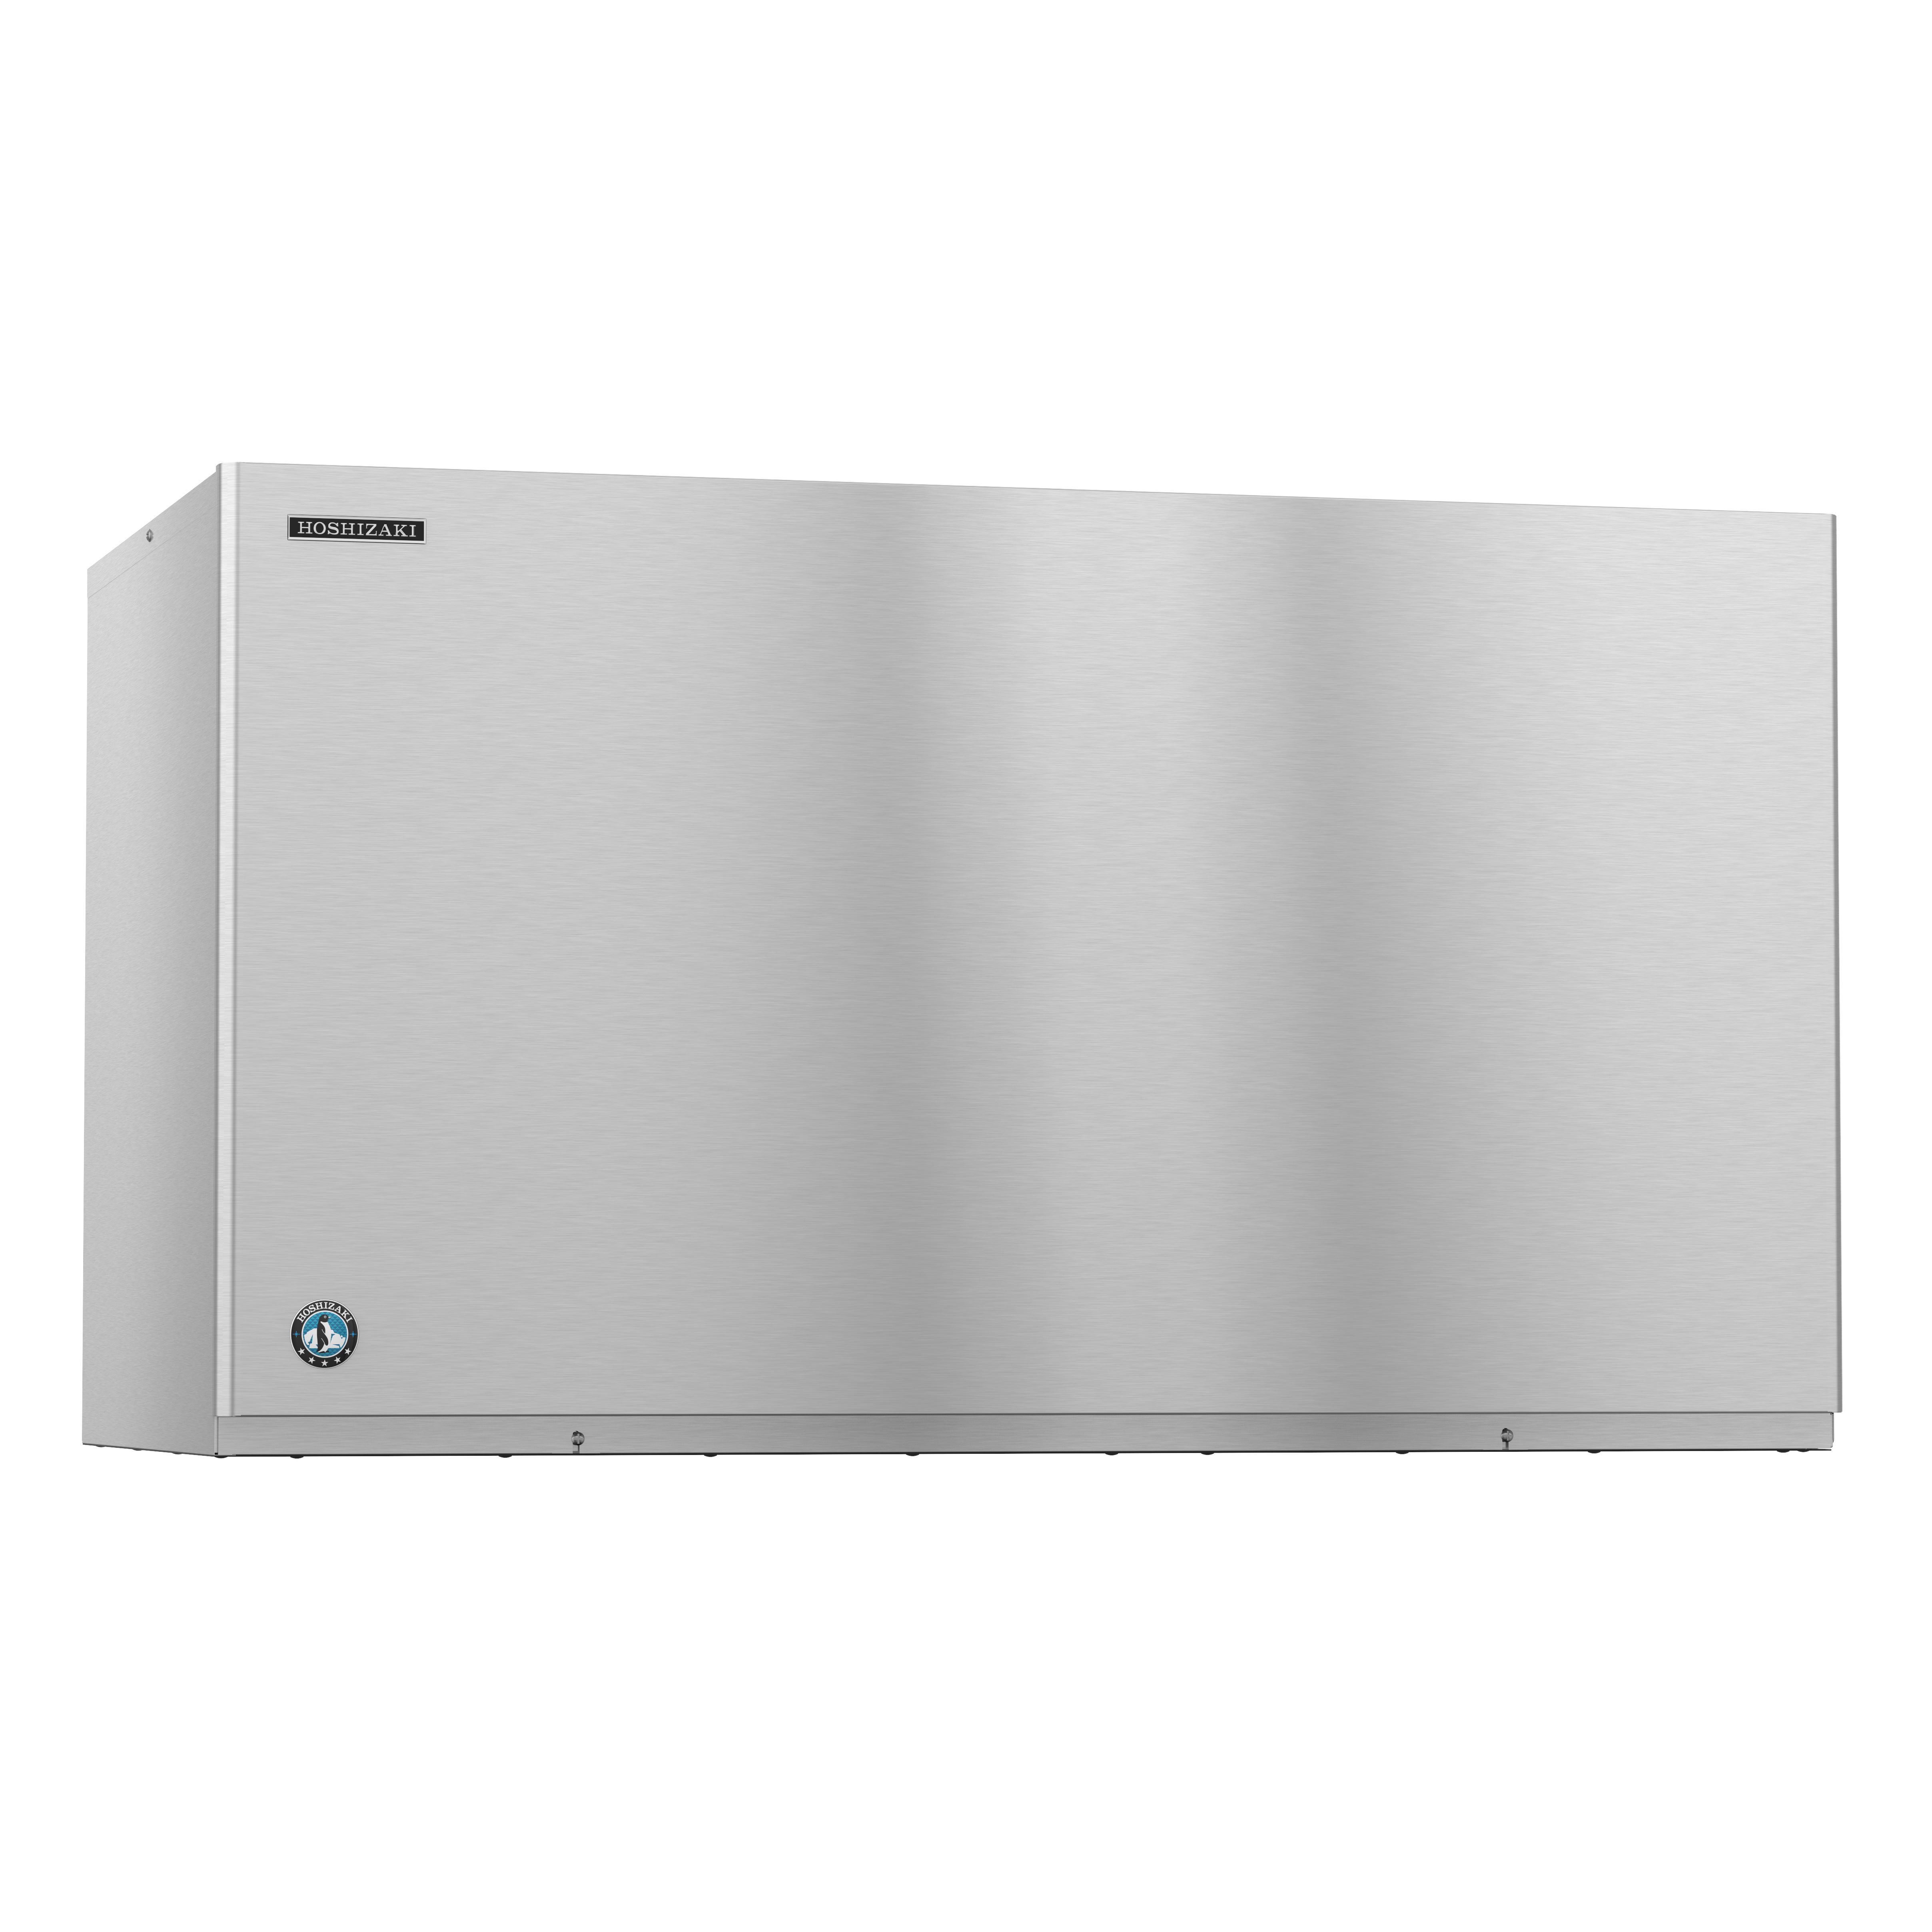 Hoshizaki KM-1301SWJ3 ice cubers, ice storage & ice dispensers